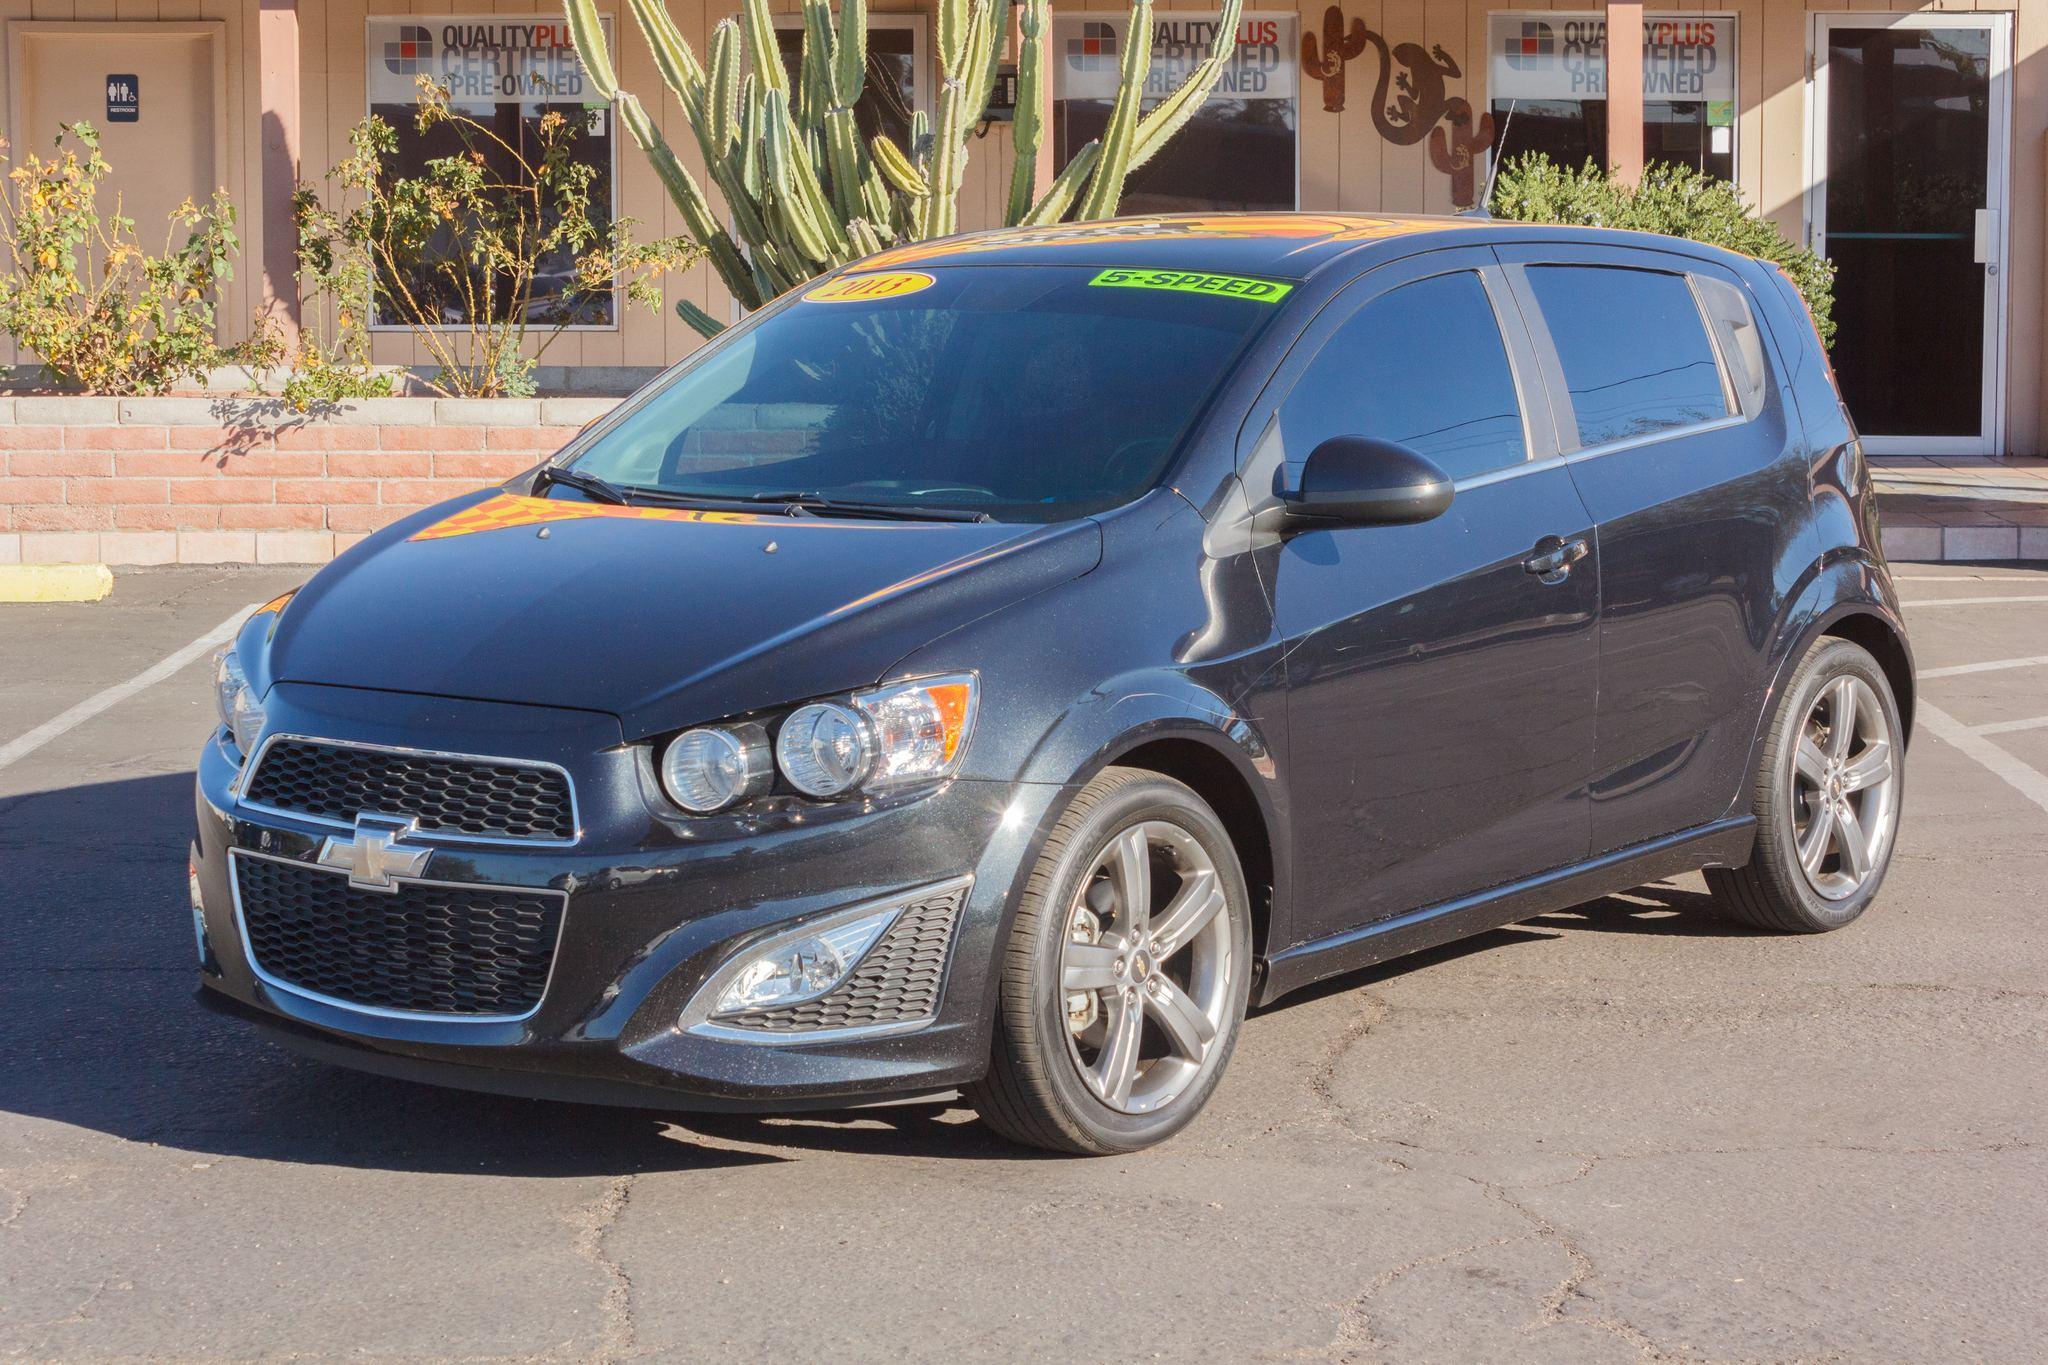 Photo of 2013 Chevrolet Sonic 4d Hatchback RS MT Black Granite Metallic